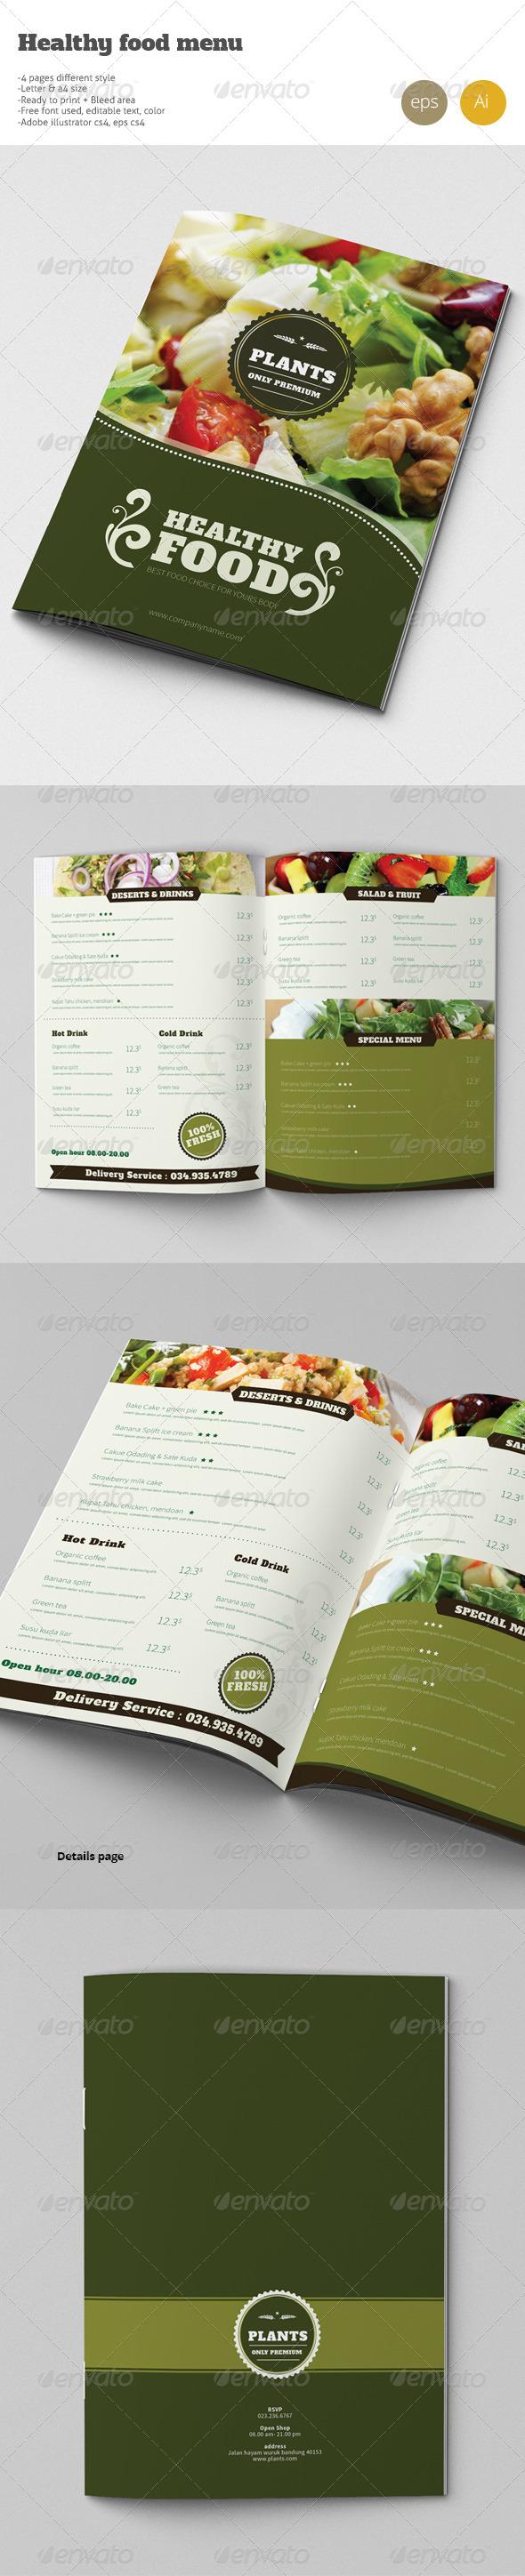 GraphicRiver Healty Restaurant Fresh Food Menu 8034627